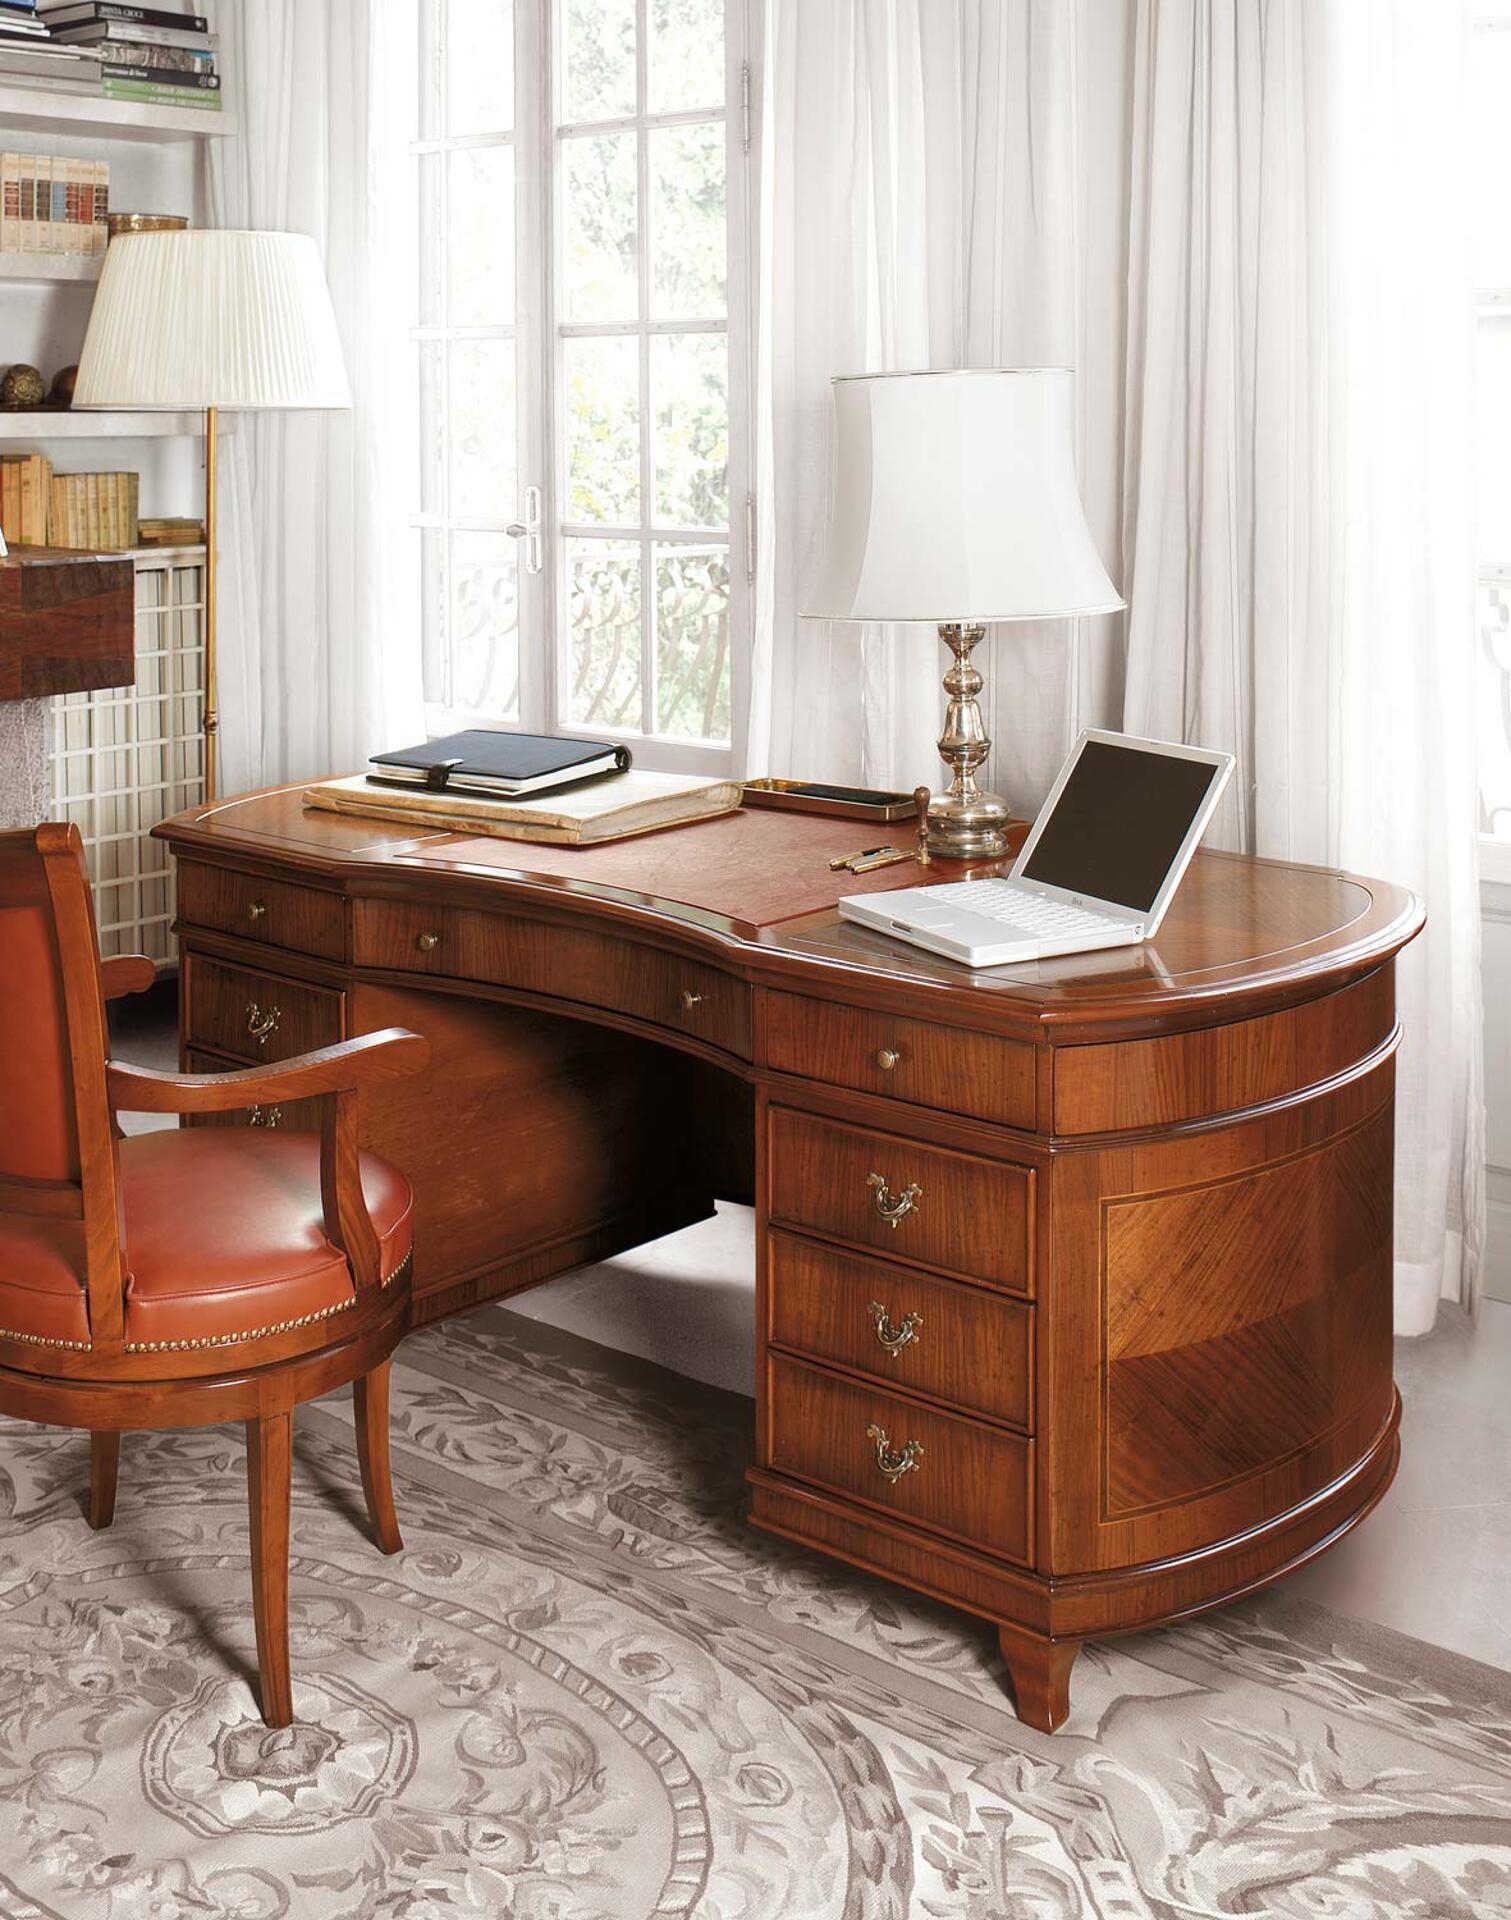 scrivania da studio sagomata a fagiolo e intarsiata a